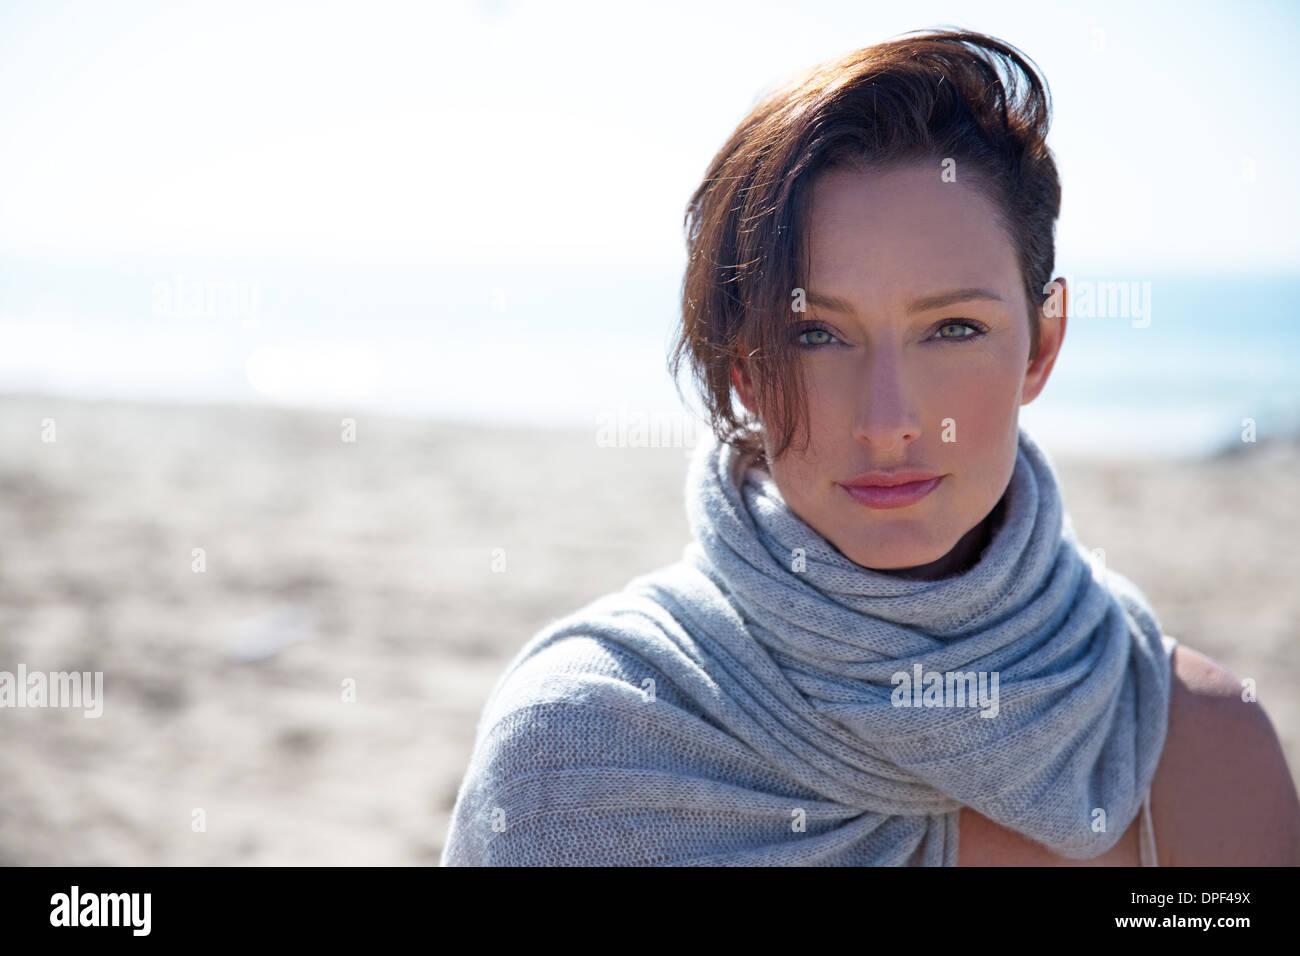 Portrait of mature woman with short hair, Newport Beach, California, USA - Stock Image